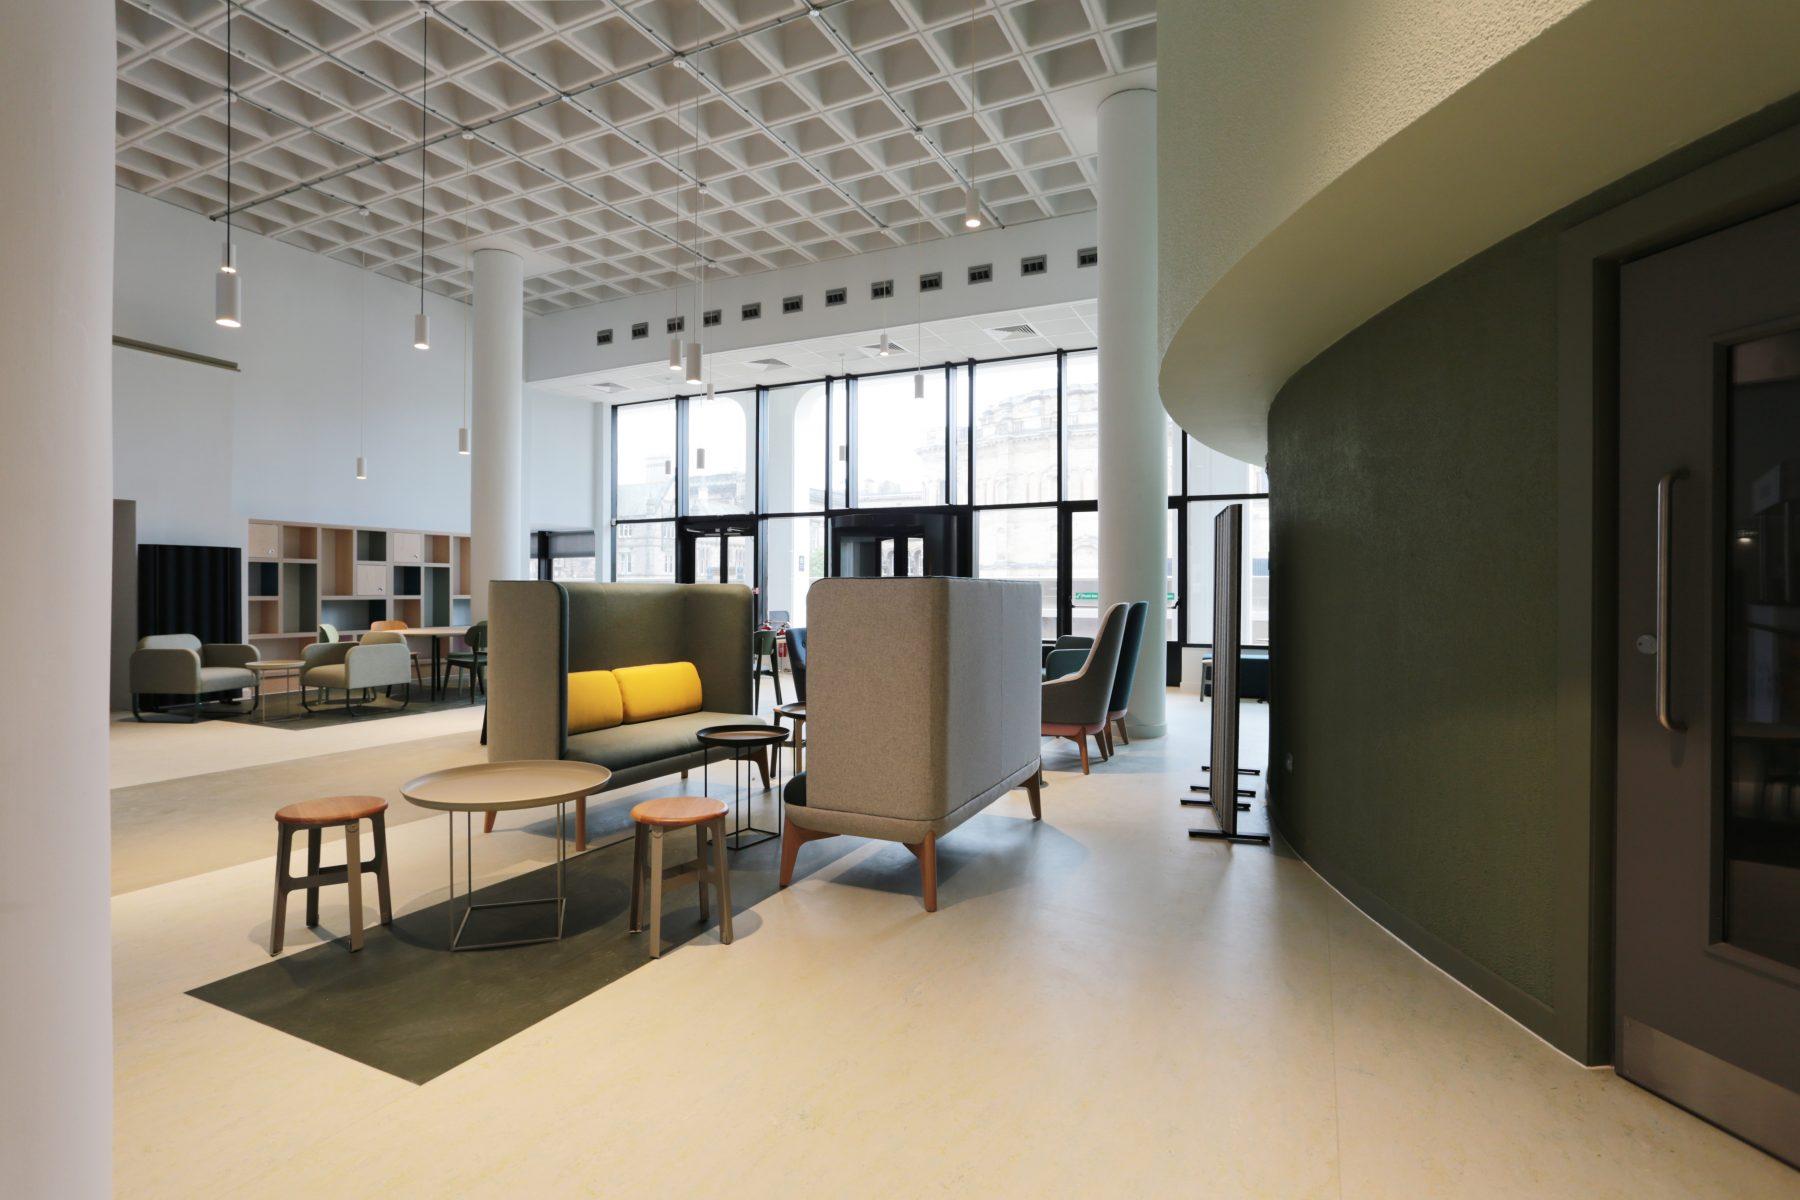 University of Edinburgh Wellbeing Centre